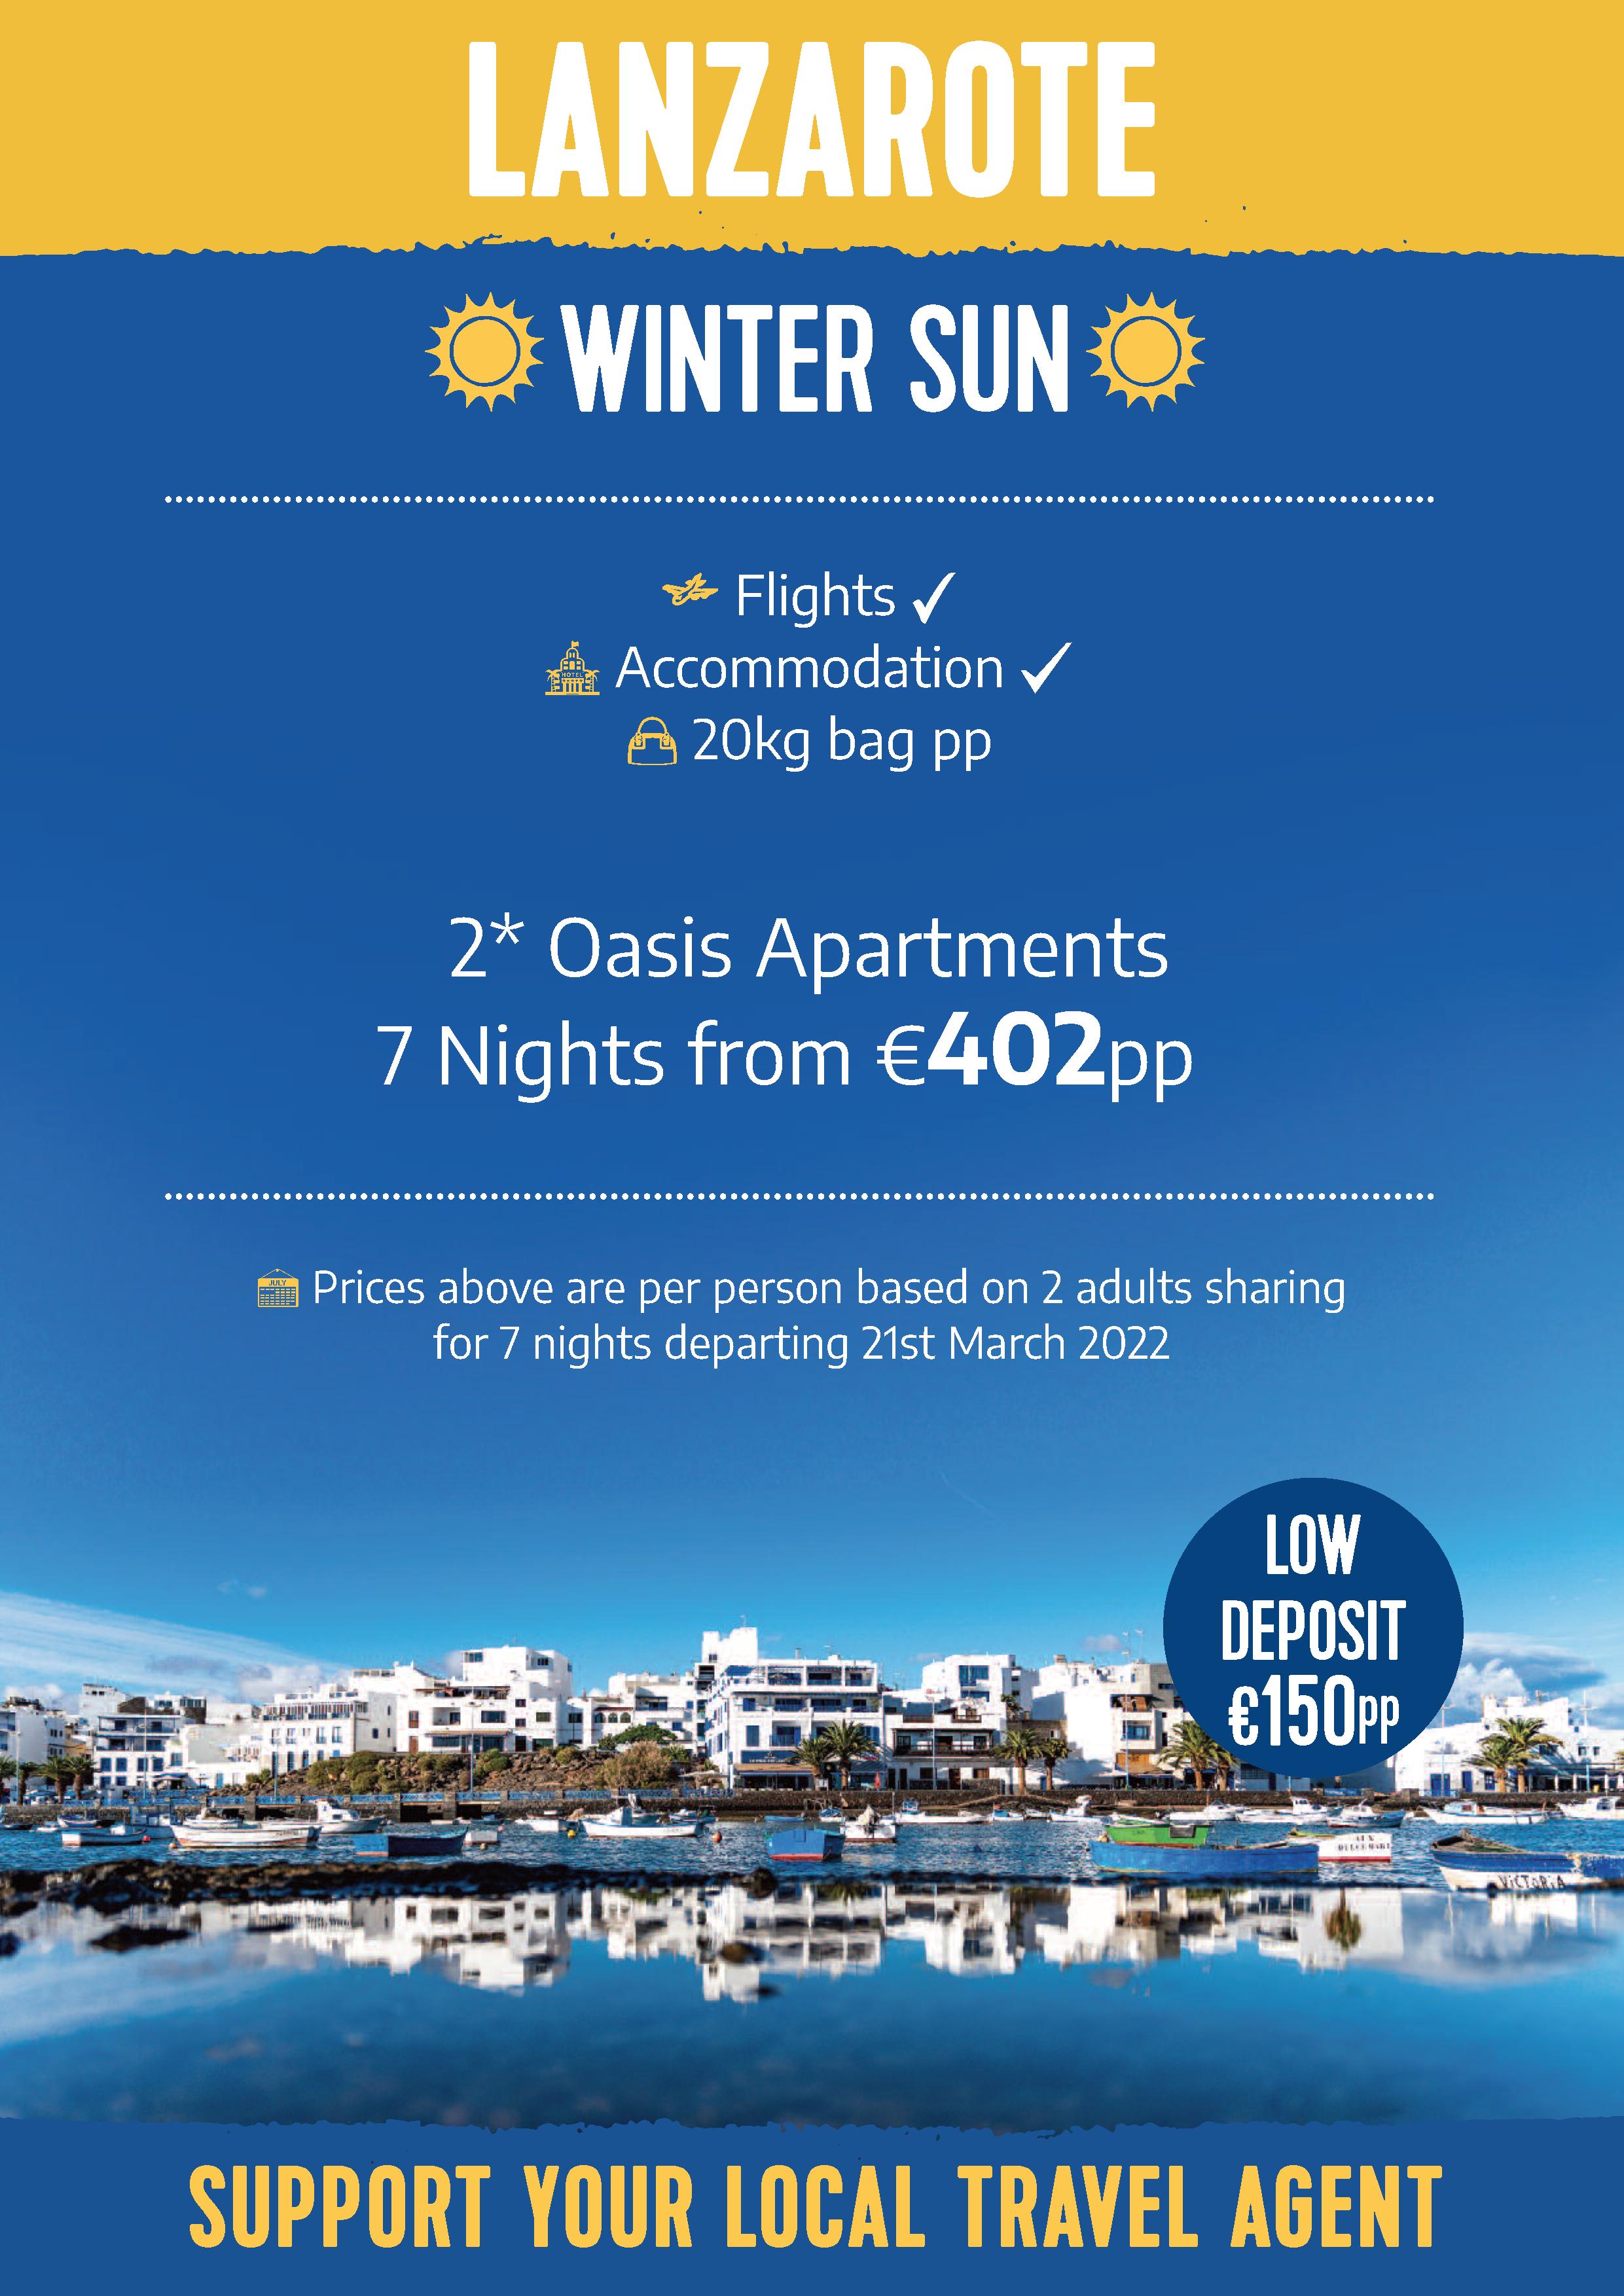 Lanzarote Winter Sun Offer